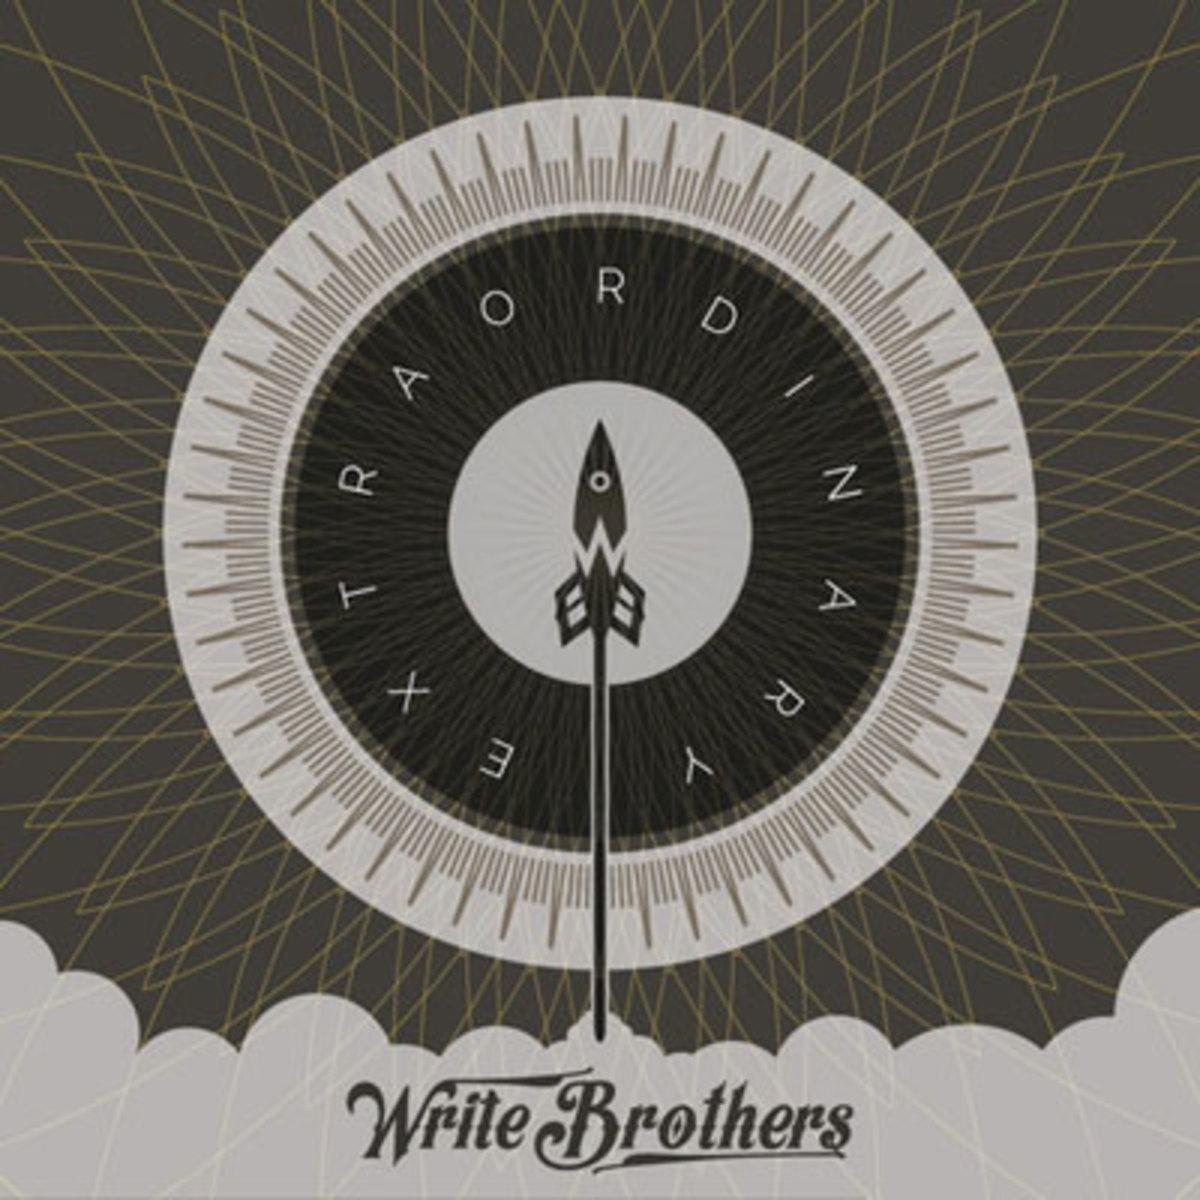 writebrothers-extrodinaryi.jpg